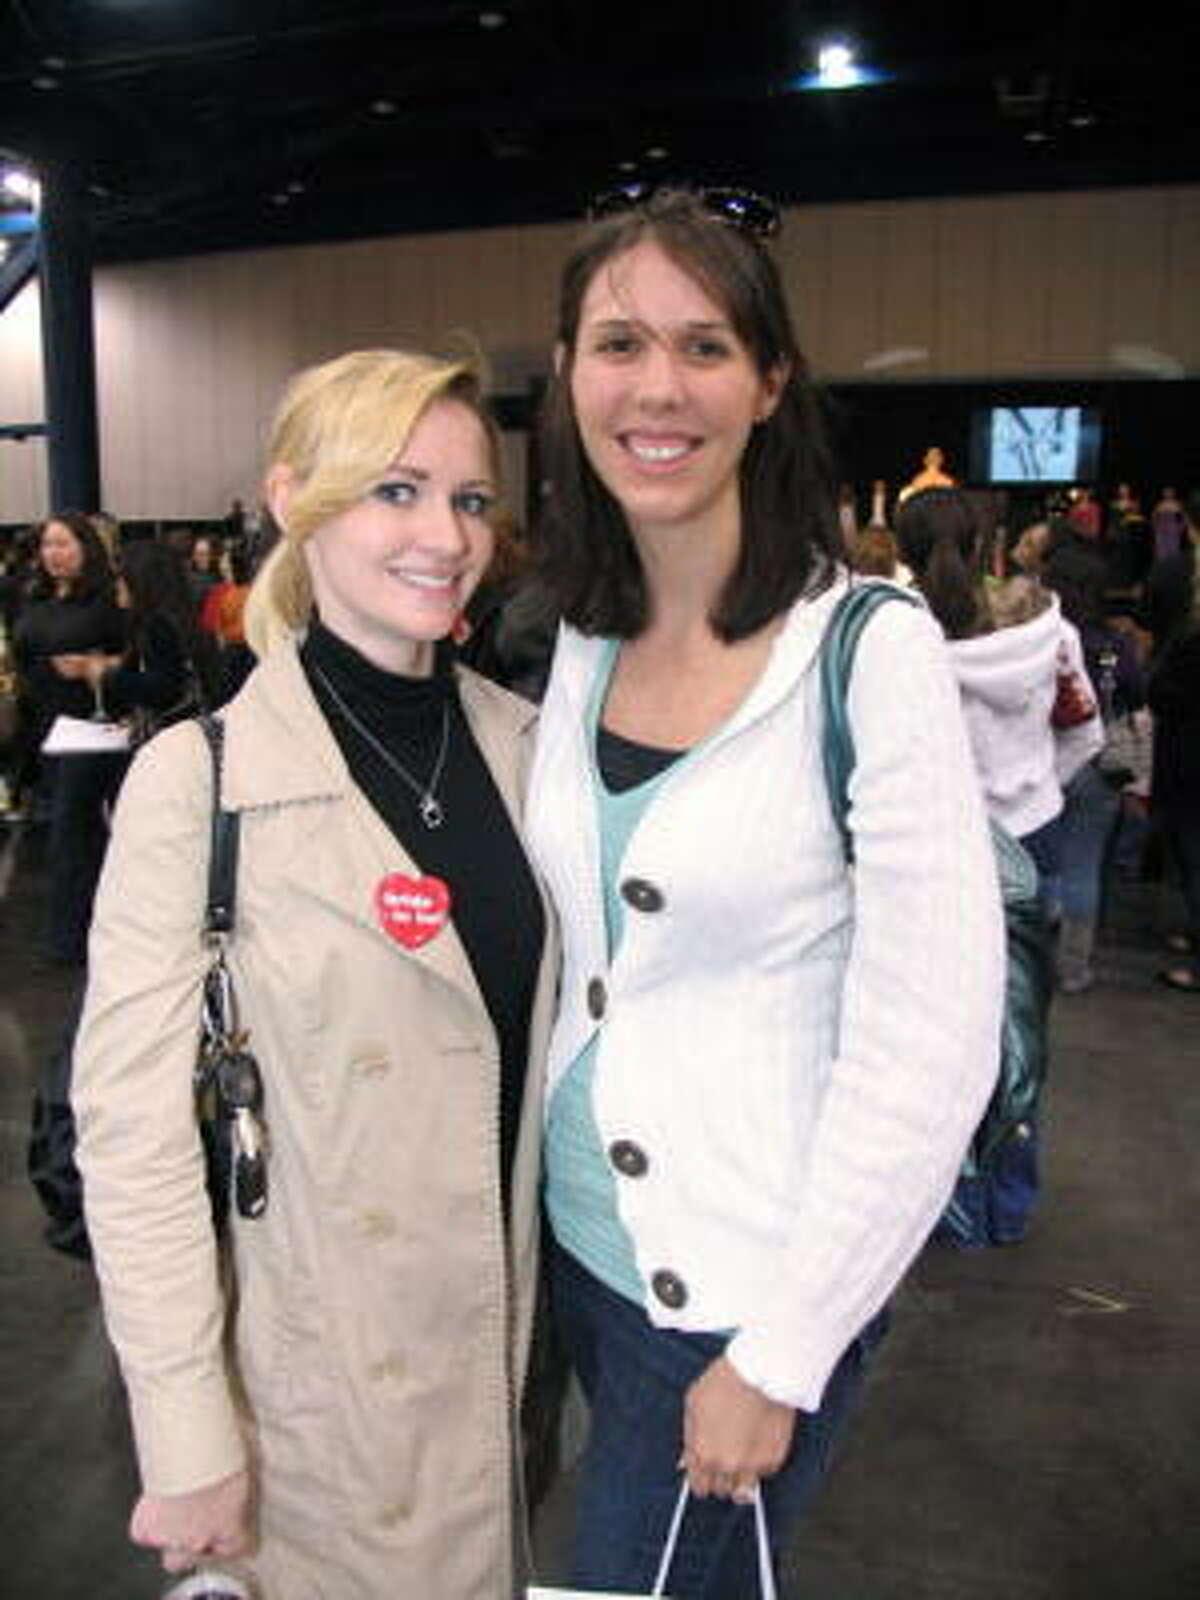 Kara Beth Armstrong, left, and Valerie Beyers